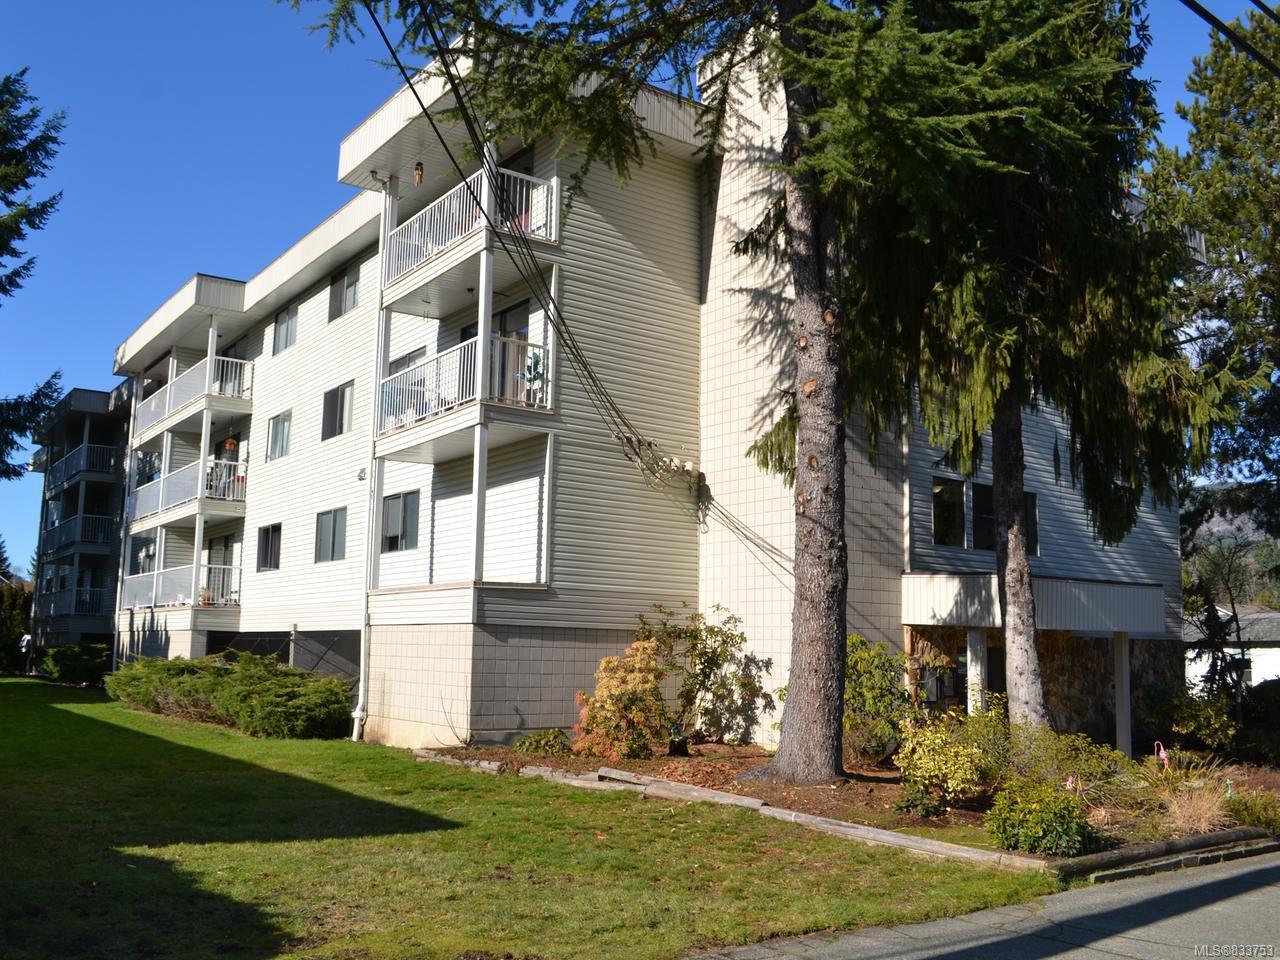 Main Photo: 106 18 King George St in LAKE COWICHAN: Du Lake Cowichan Condo for sale (Duncan)  : MLS®# 833753